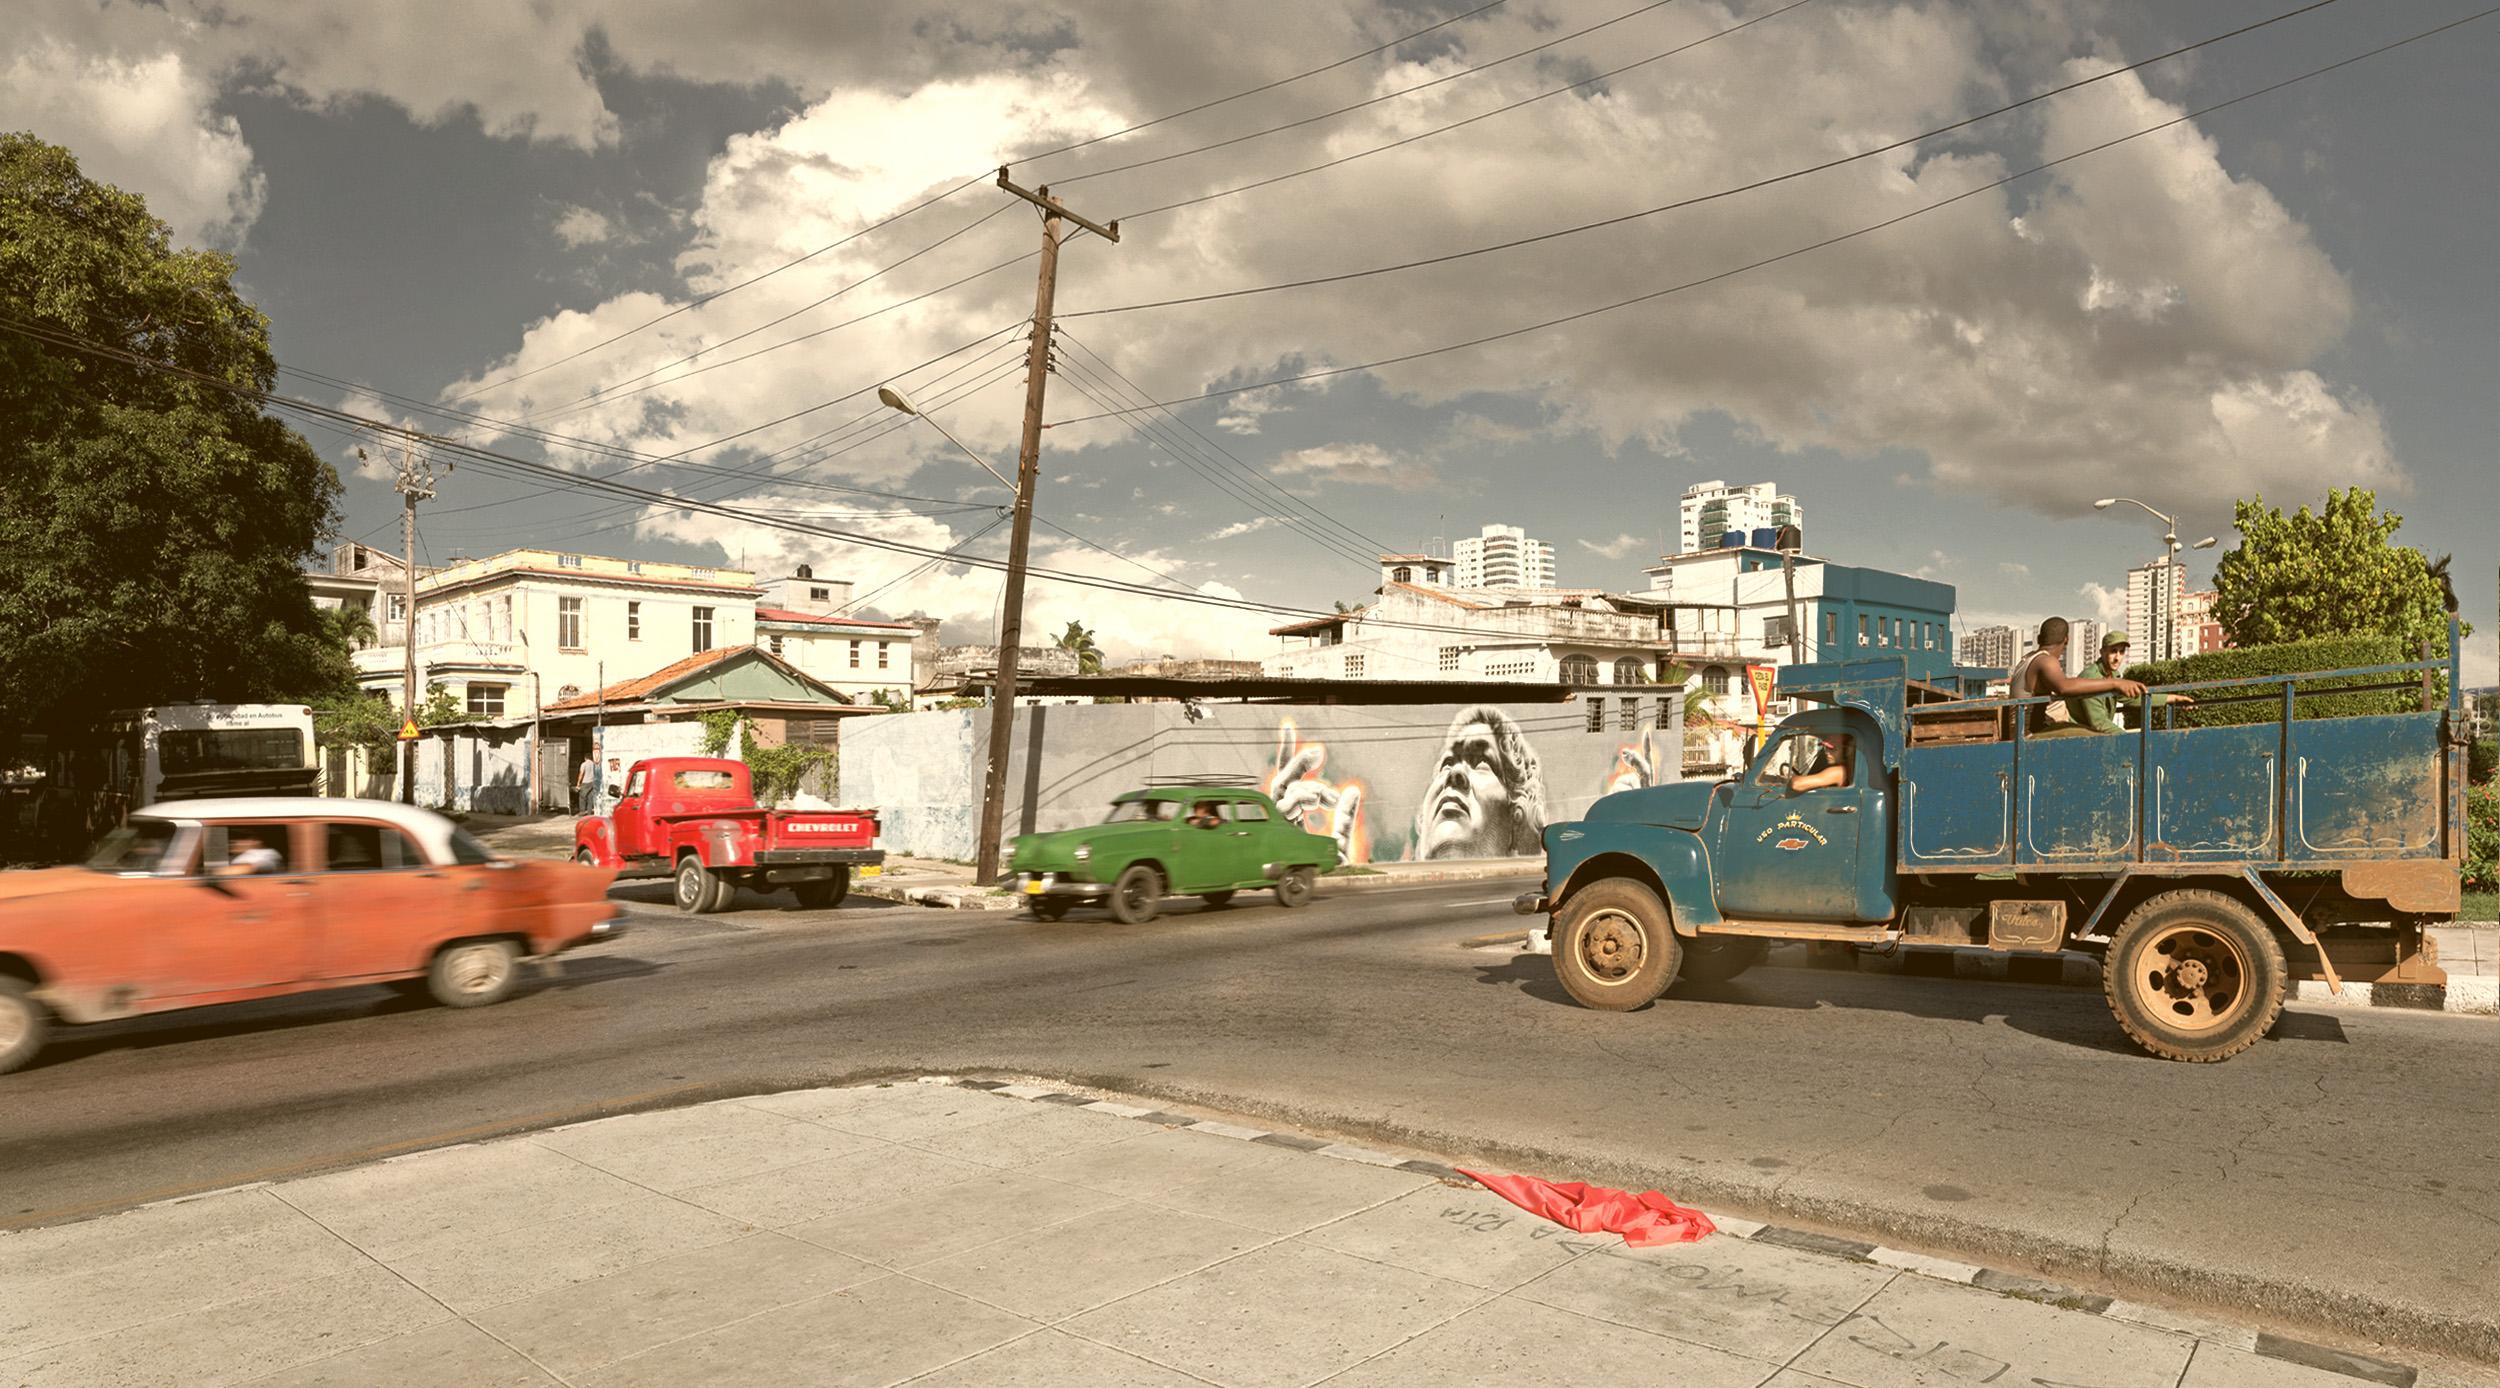 CUHA-AVP - Avenida Presidente.jpg